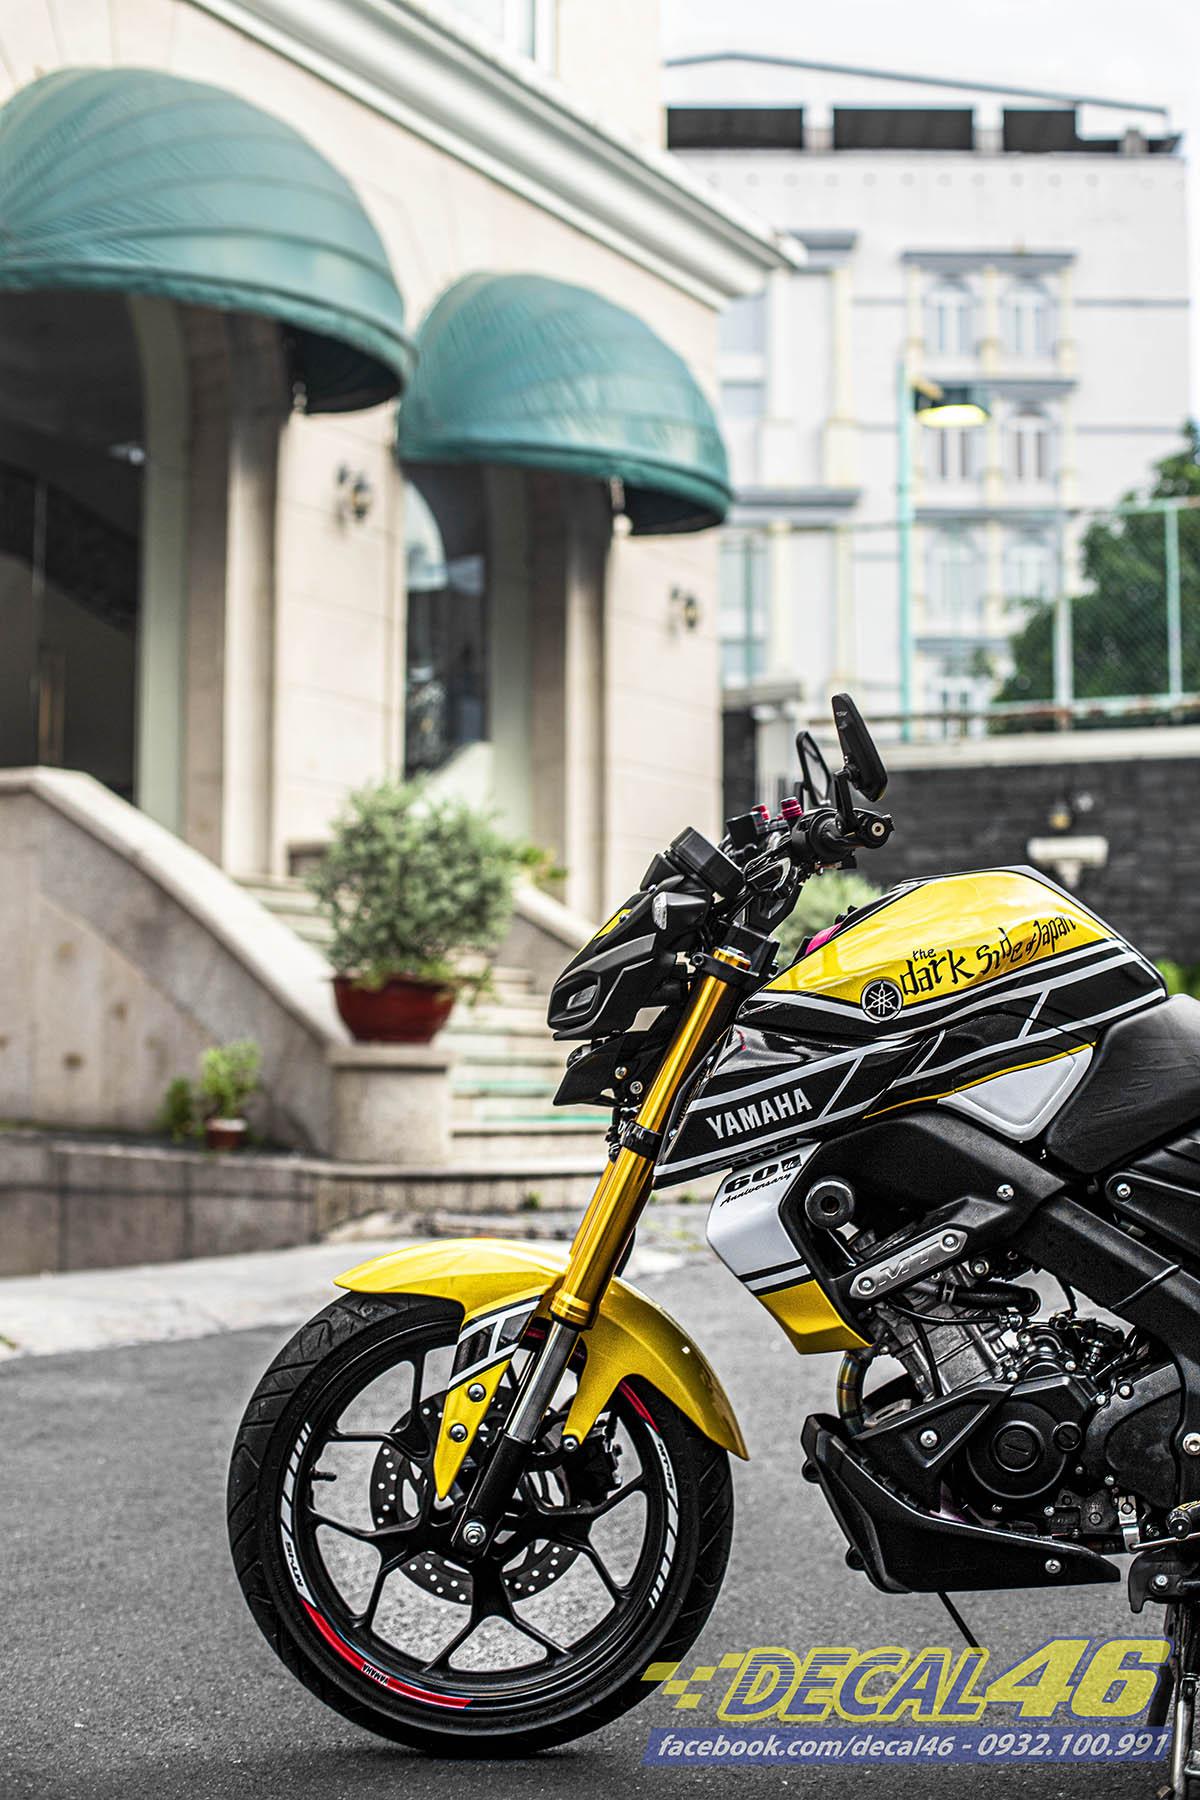 https://decal46.com/Tem xe Yamaha MT15 - 001 - thiết kế